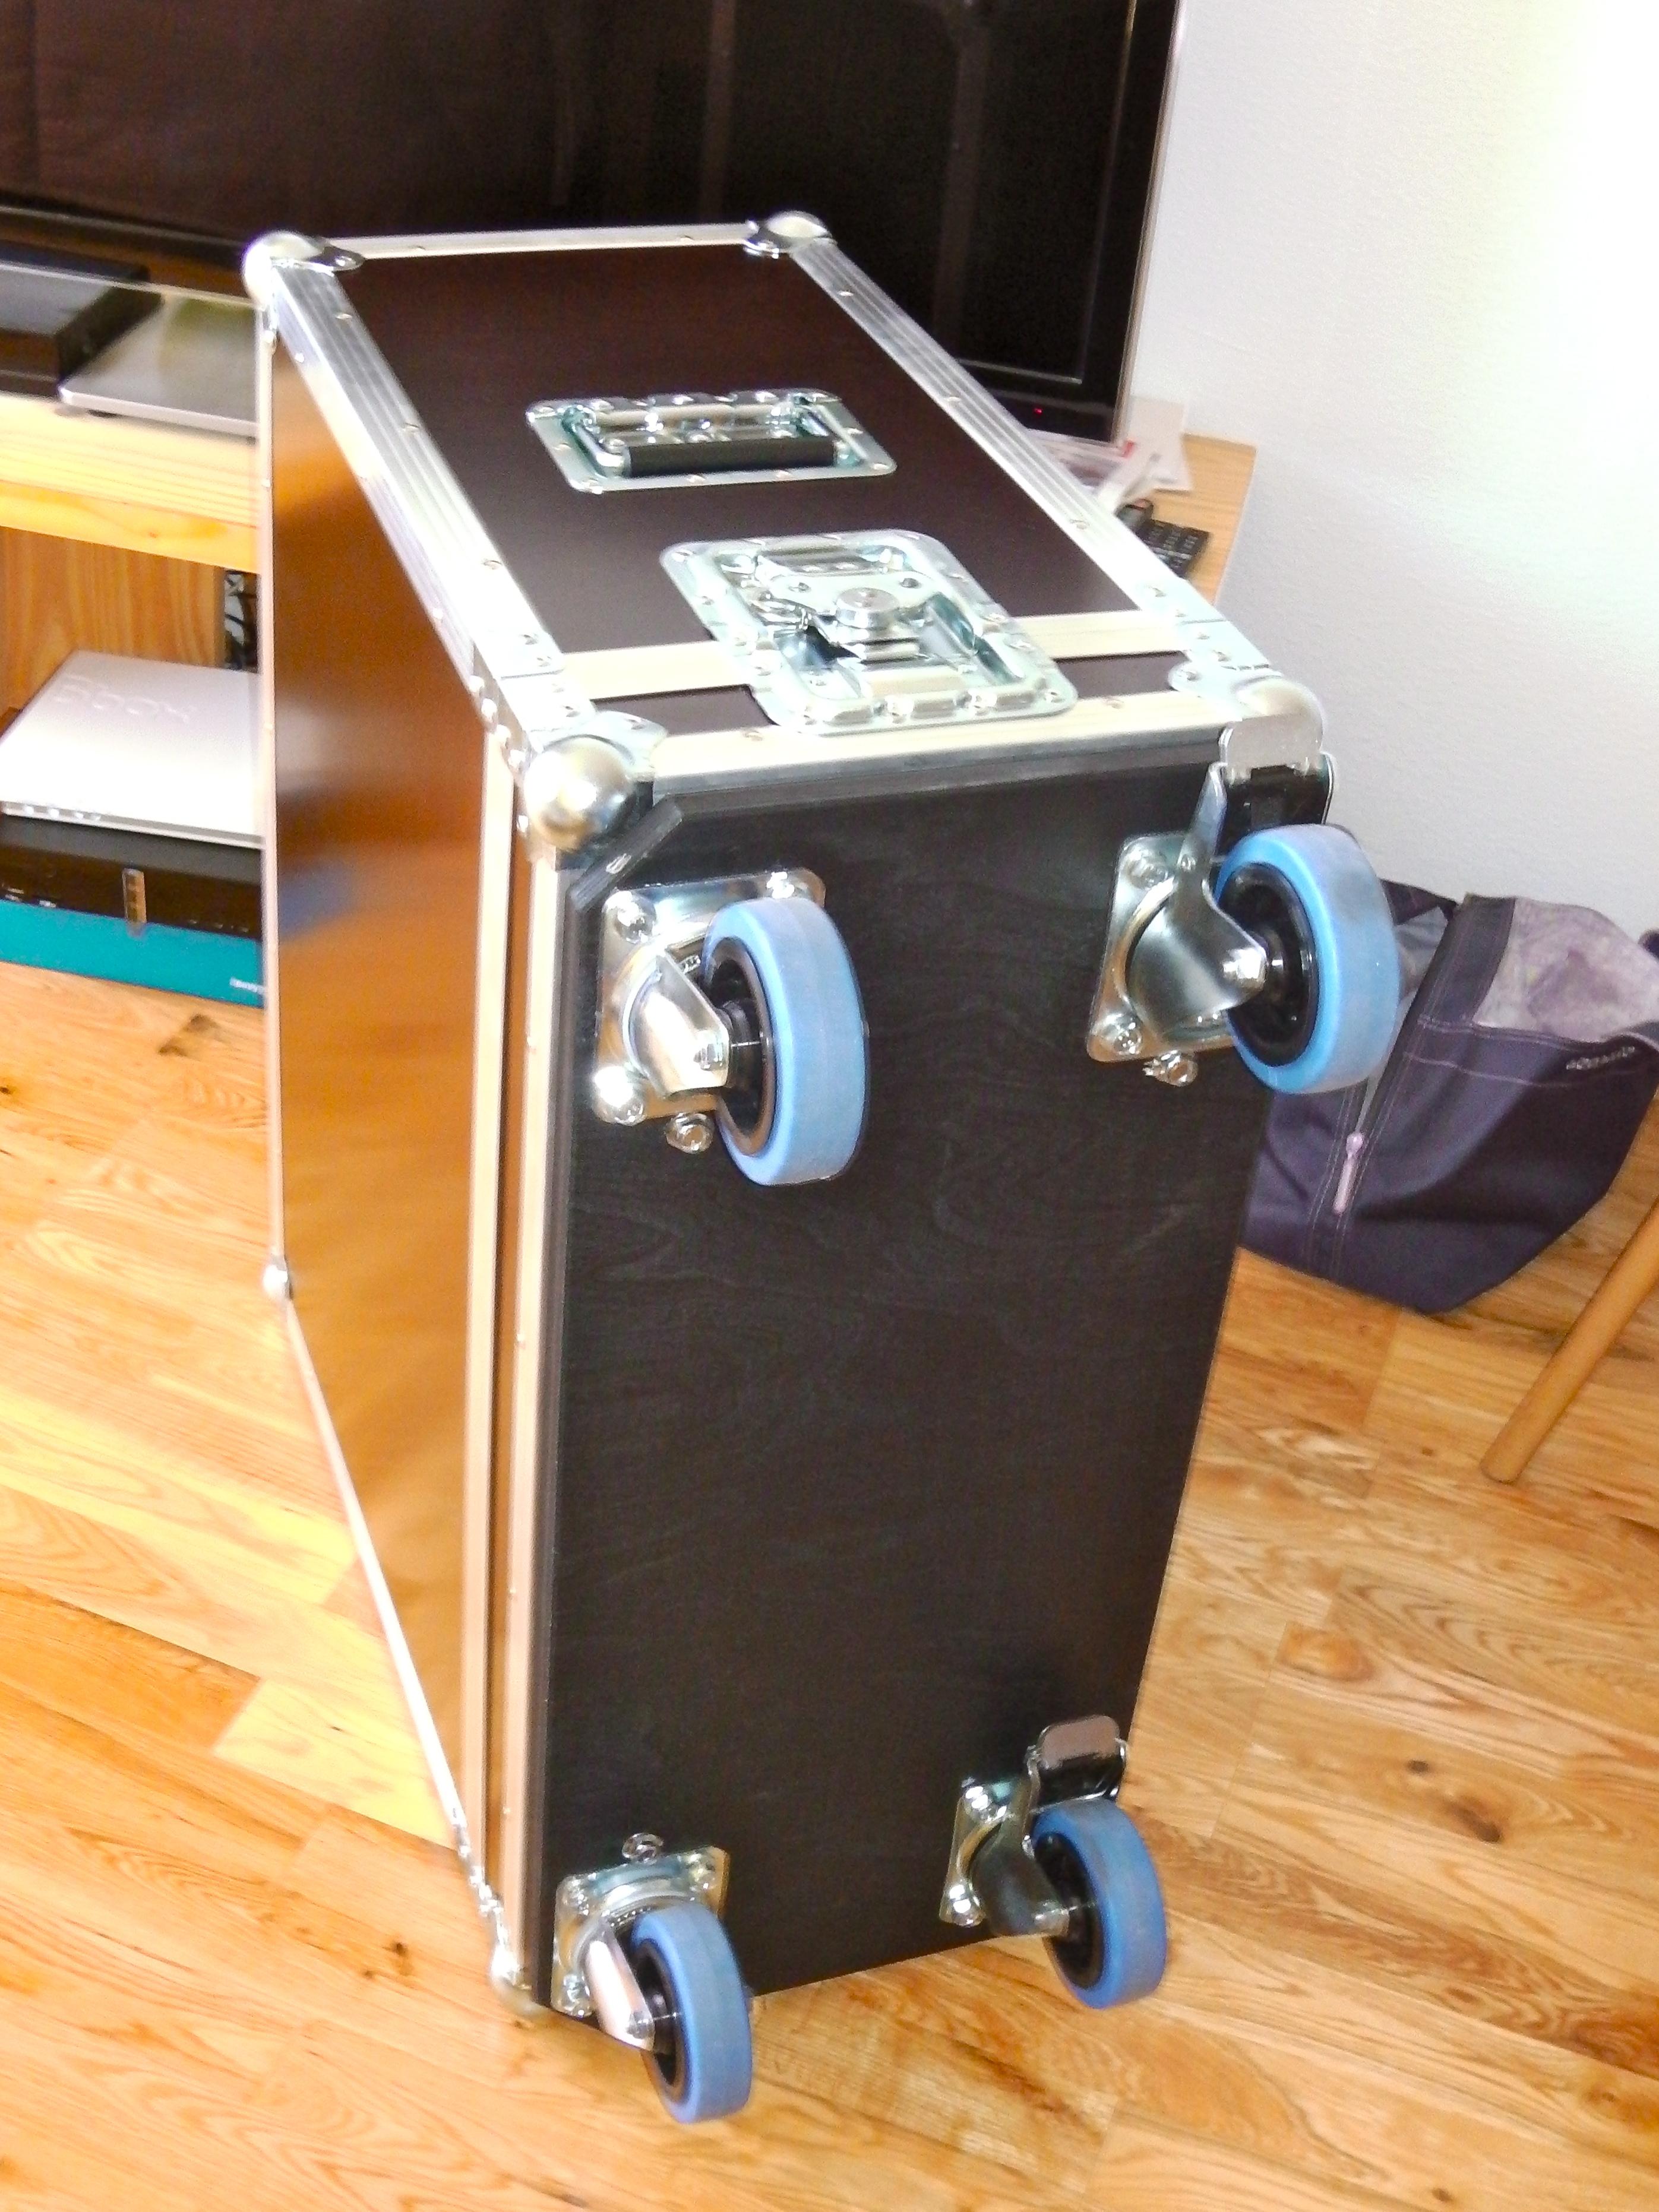 thon flight case ampli guitare image 575007 audiofanzine. Black Bedroom Furniture Sets. Home Design Ideas